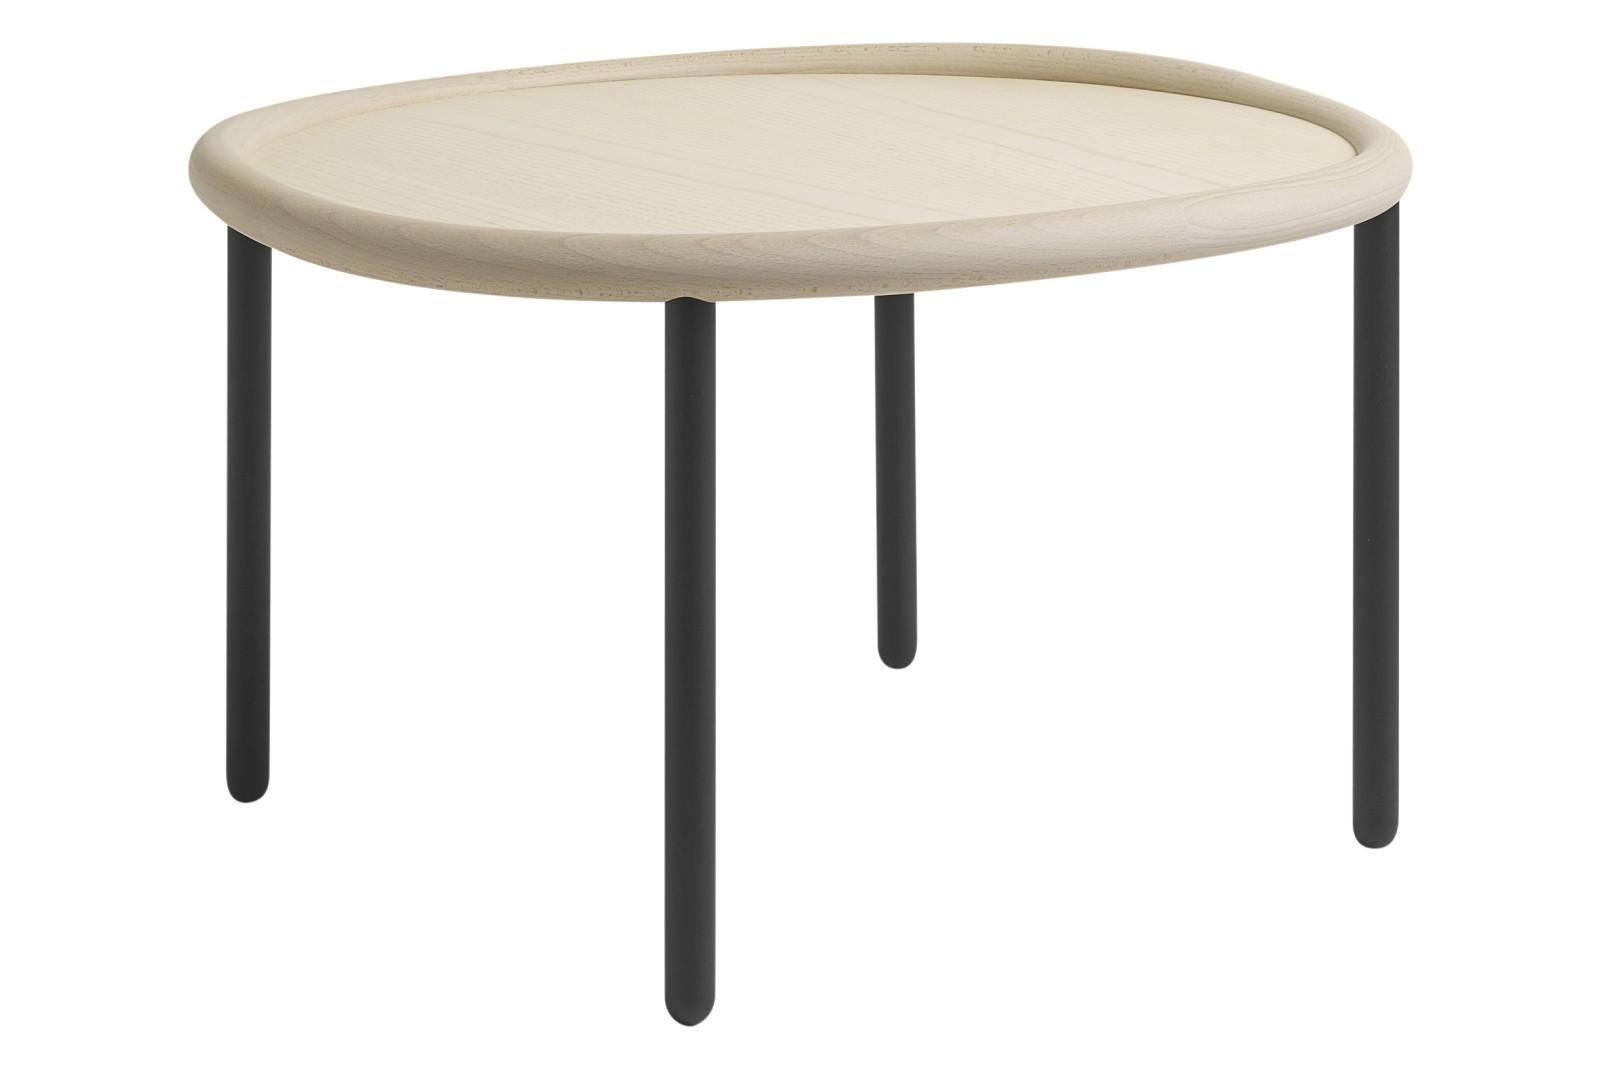 Serve Side Table Light White Top, Black Legs, Large